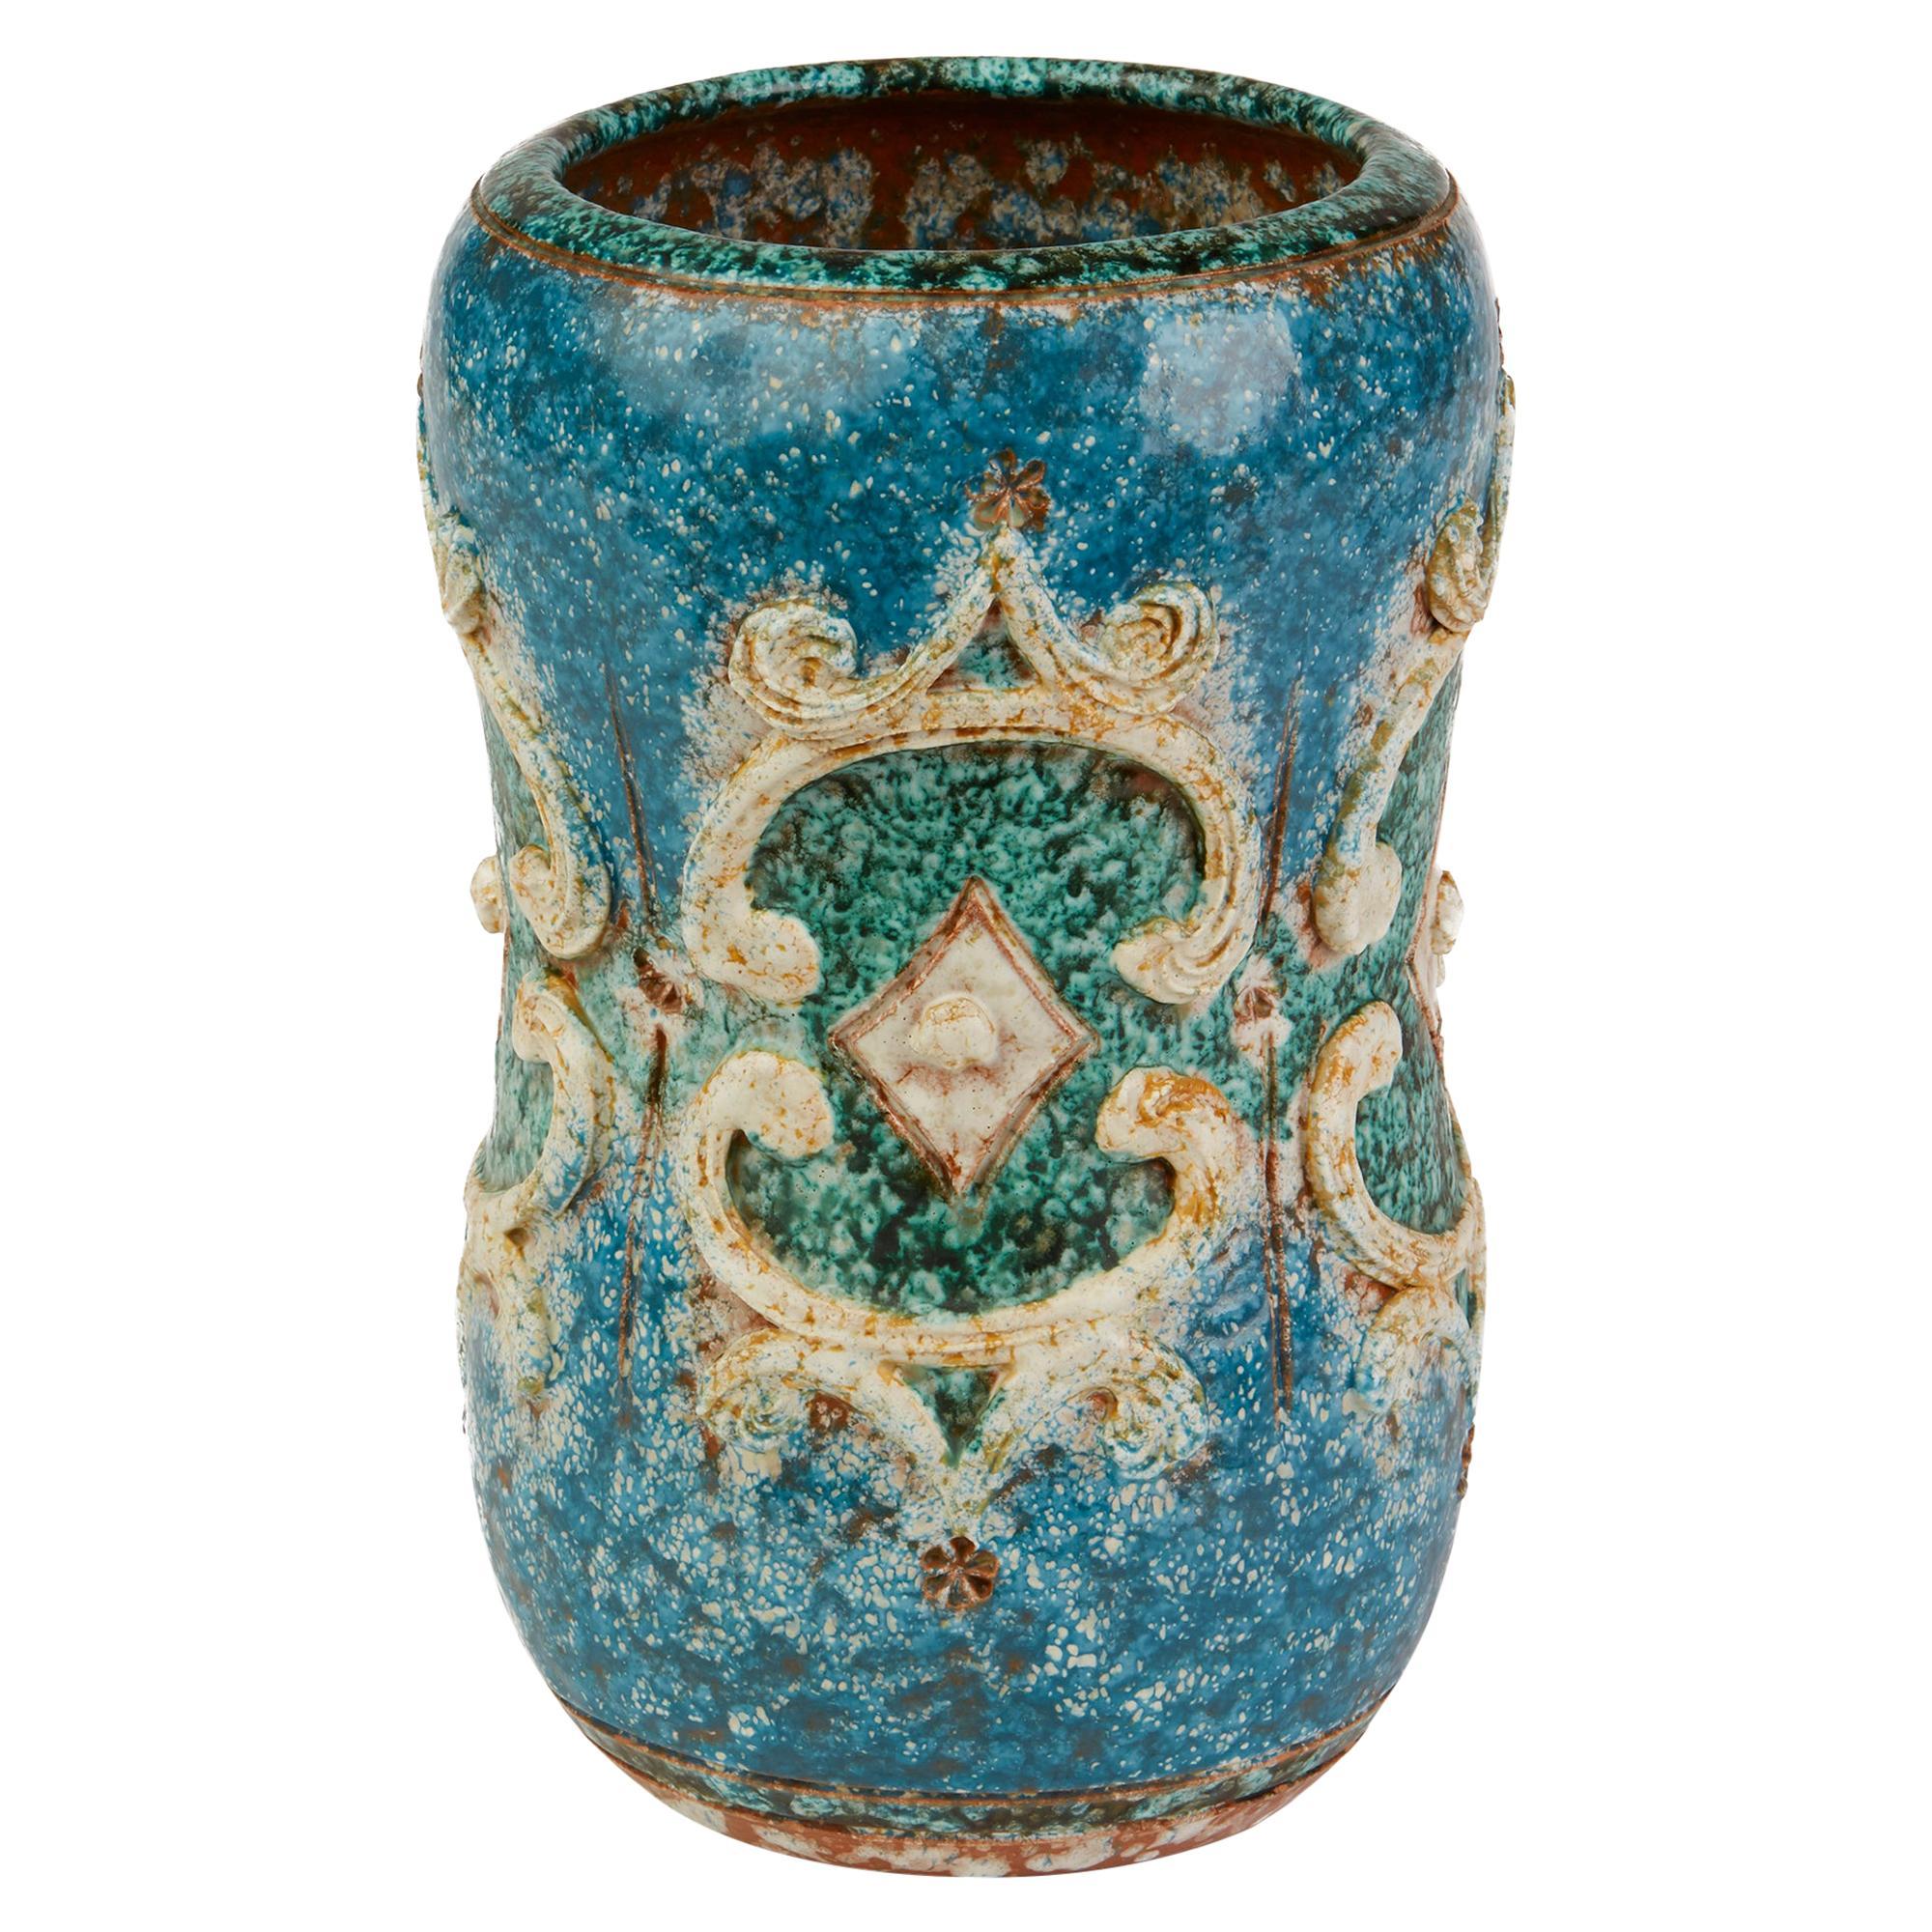 Alvino Bagni Raymor Attributed Unusual Midcentury Italian Art Pottery Vase